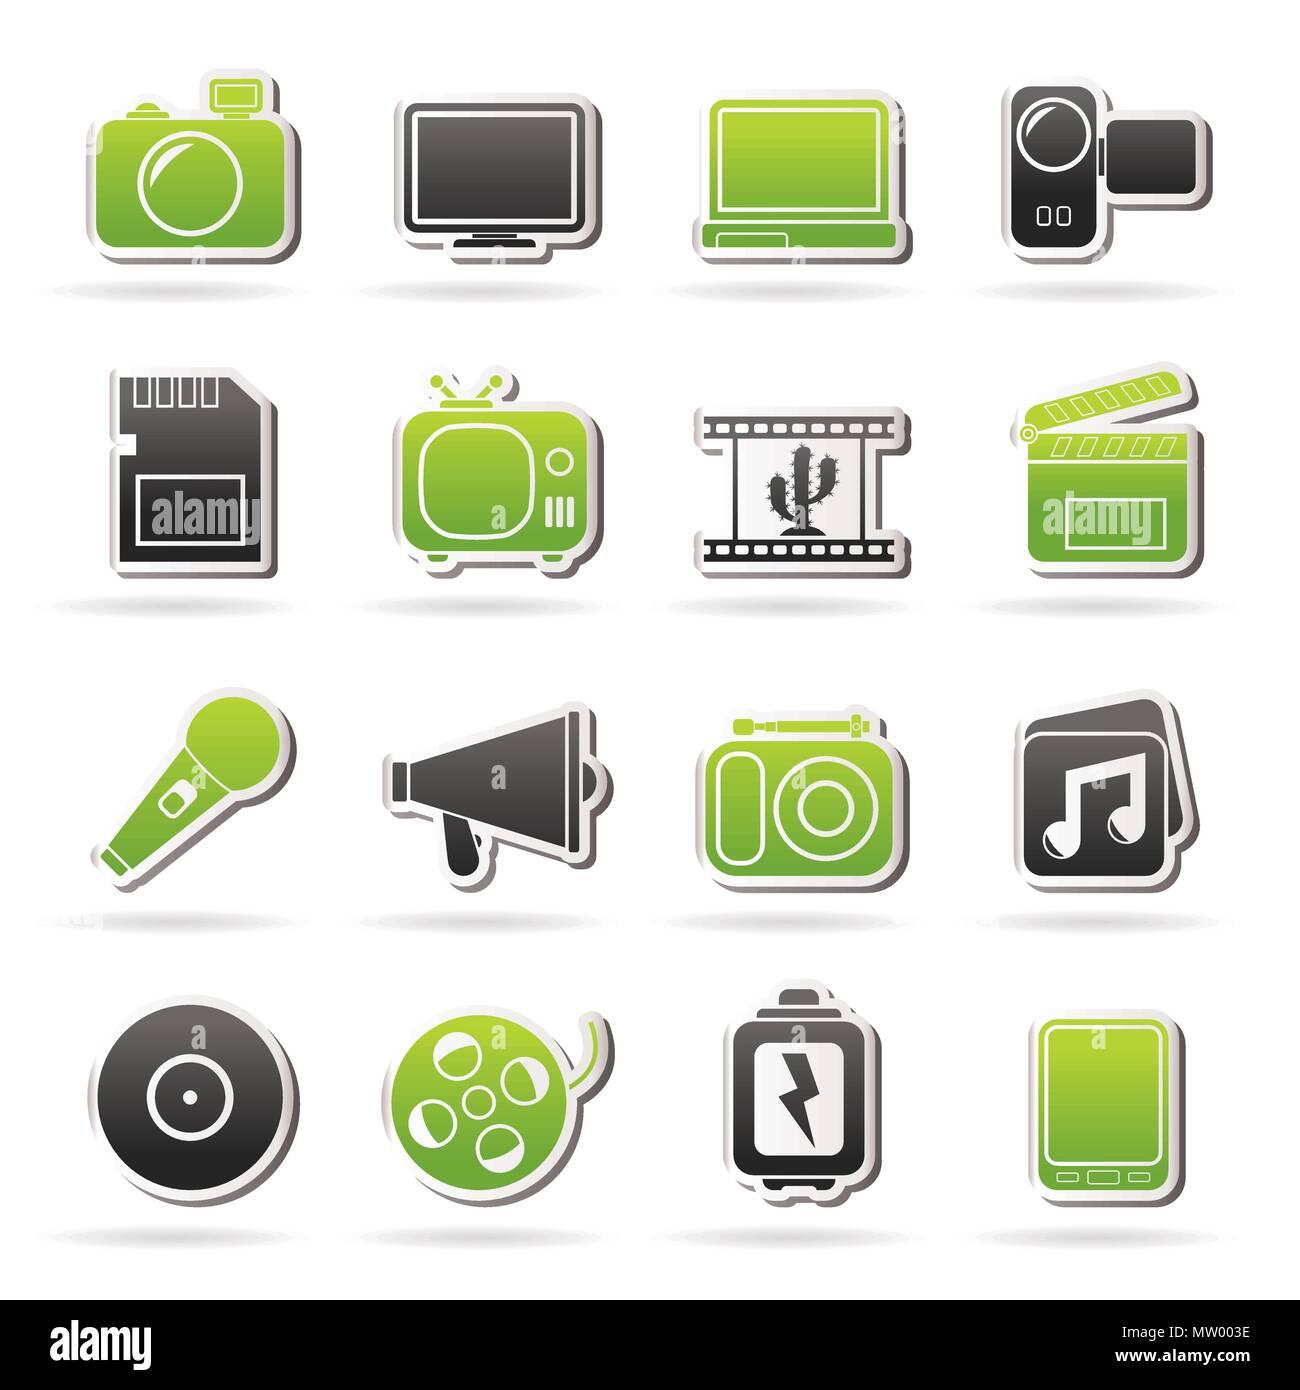 Wonderbaar Multimedia und Technik Symbole - Vektor Icon Set Vektor Abbildung AL-98